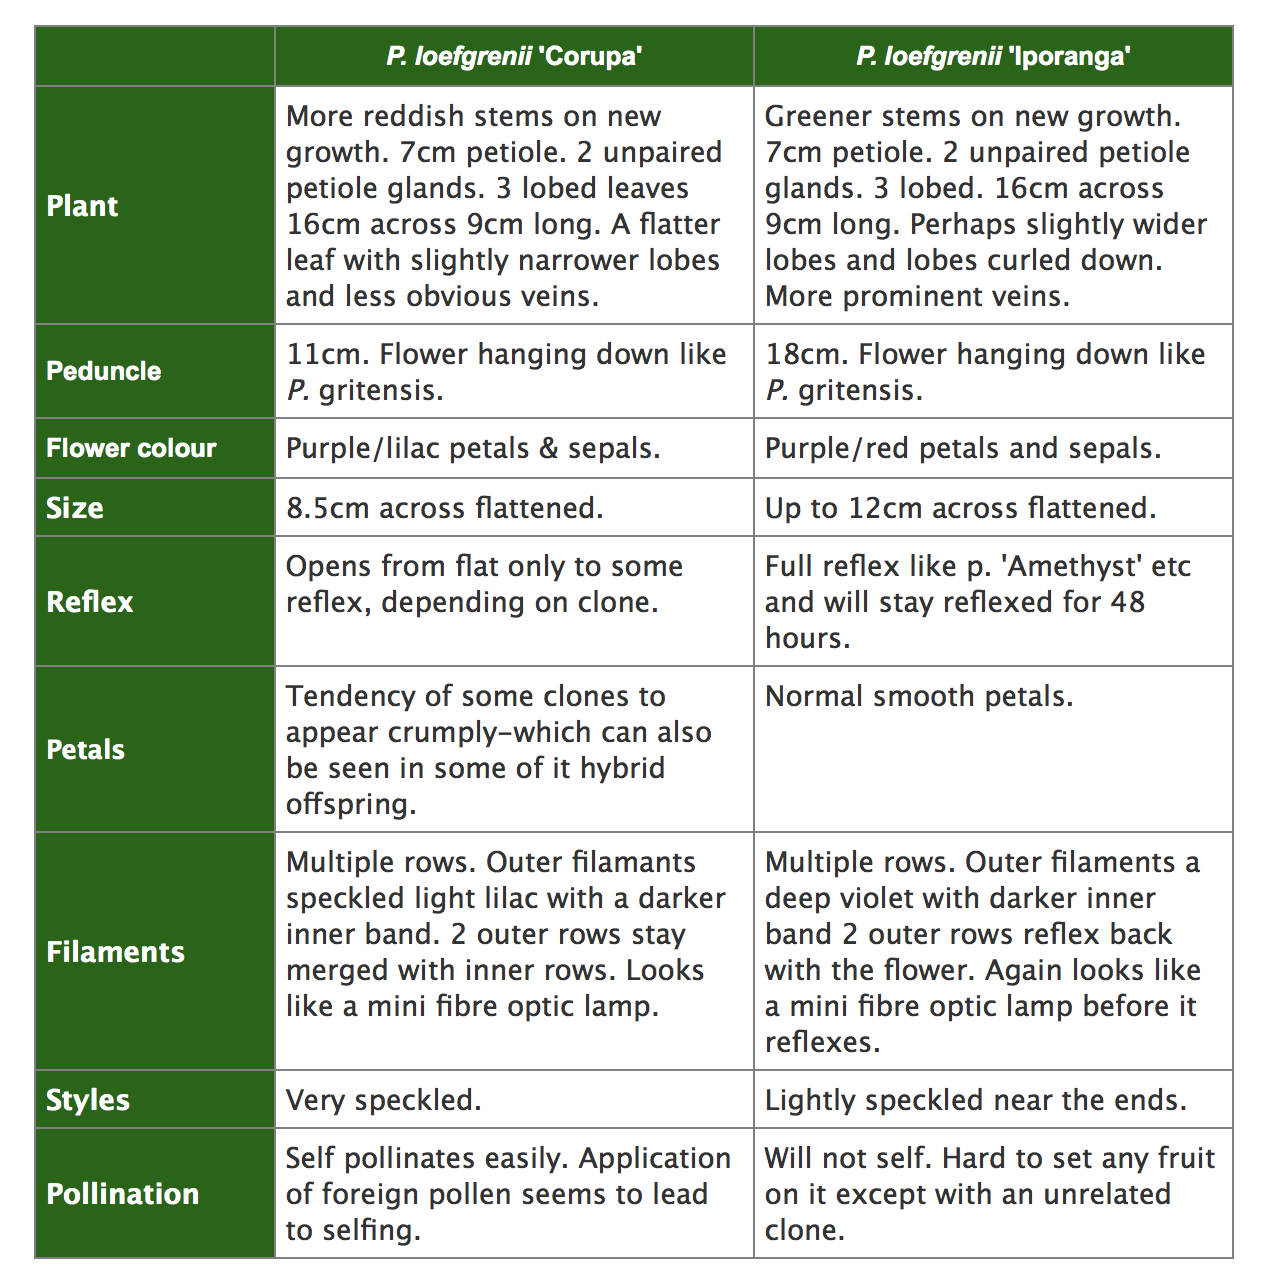 Passiflora loefgrenii Corupa Iporanga comparison table